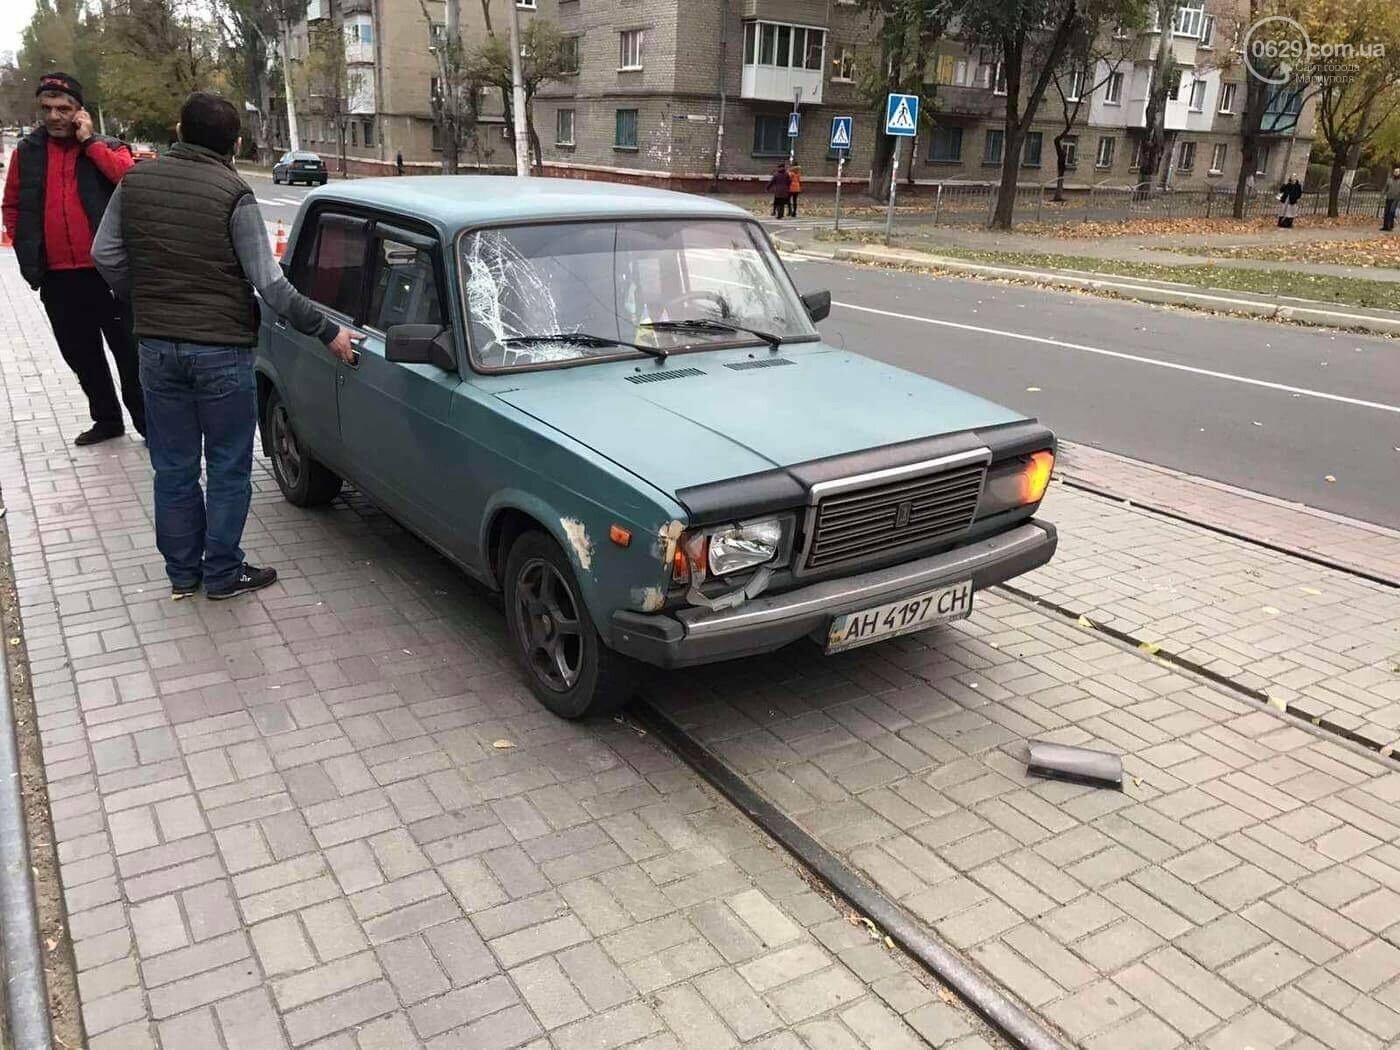 На Левом берегу автомобиль сбил пешехода,-ФОТО, фото-3